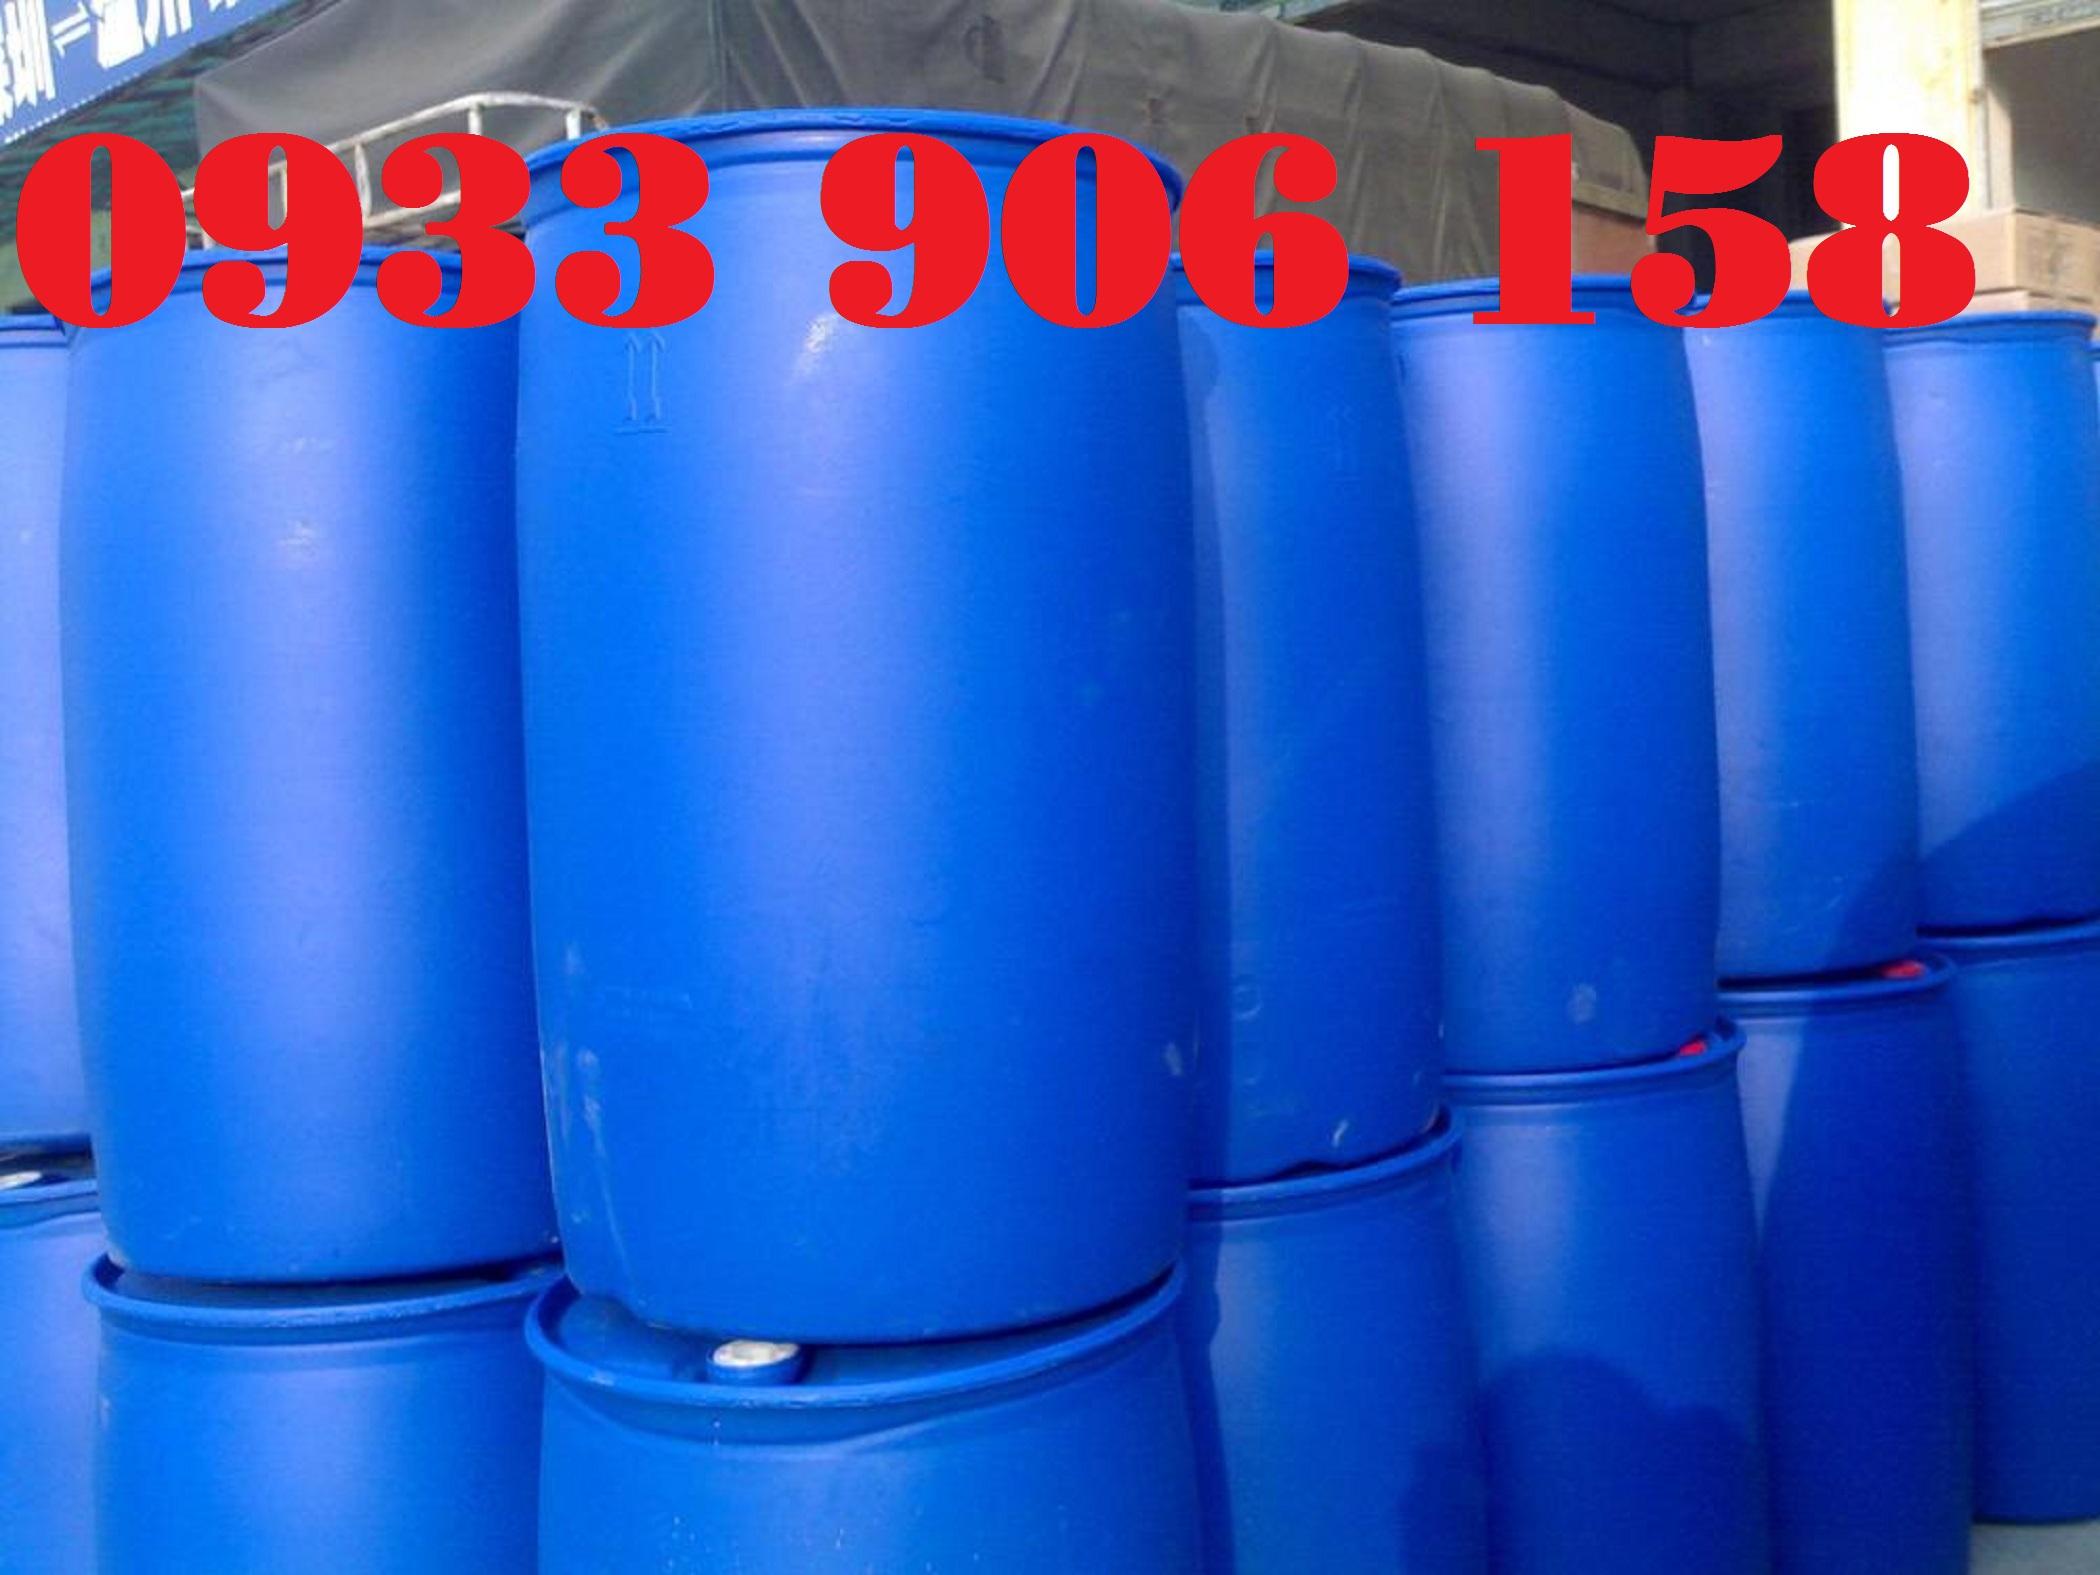 Bán chất tẩy rửa Las tại đồng nai-Tìm mua hóa chất Las tại đồng nai- bán hóa chất Sodium Linear Alkylbenzene Solfonate